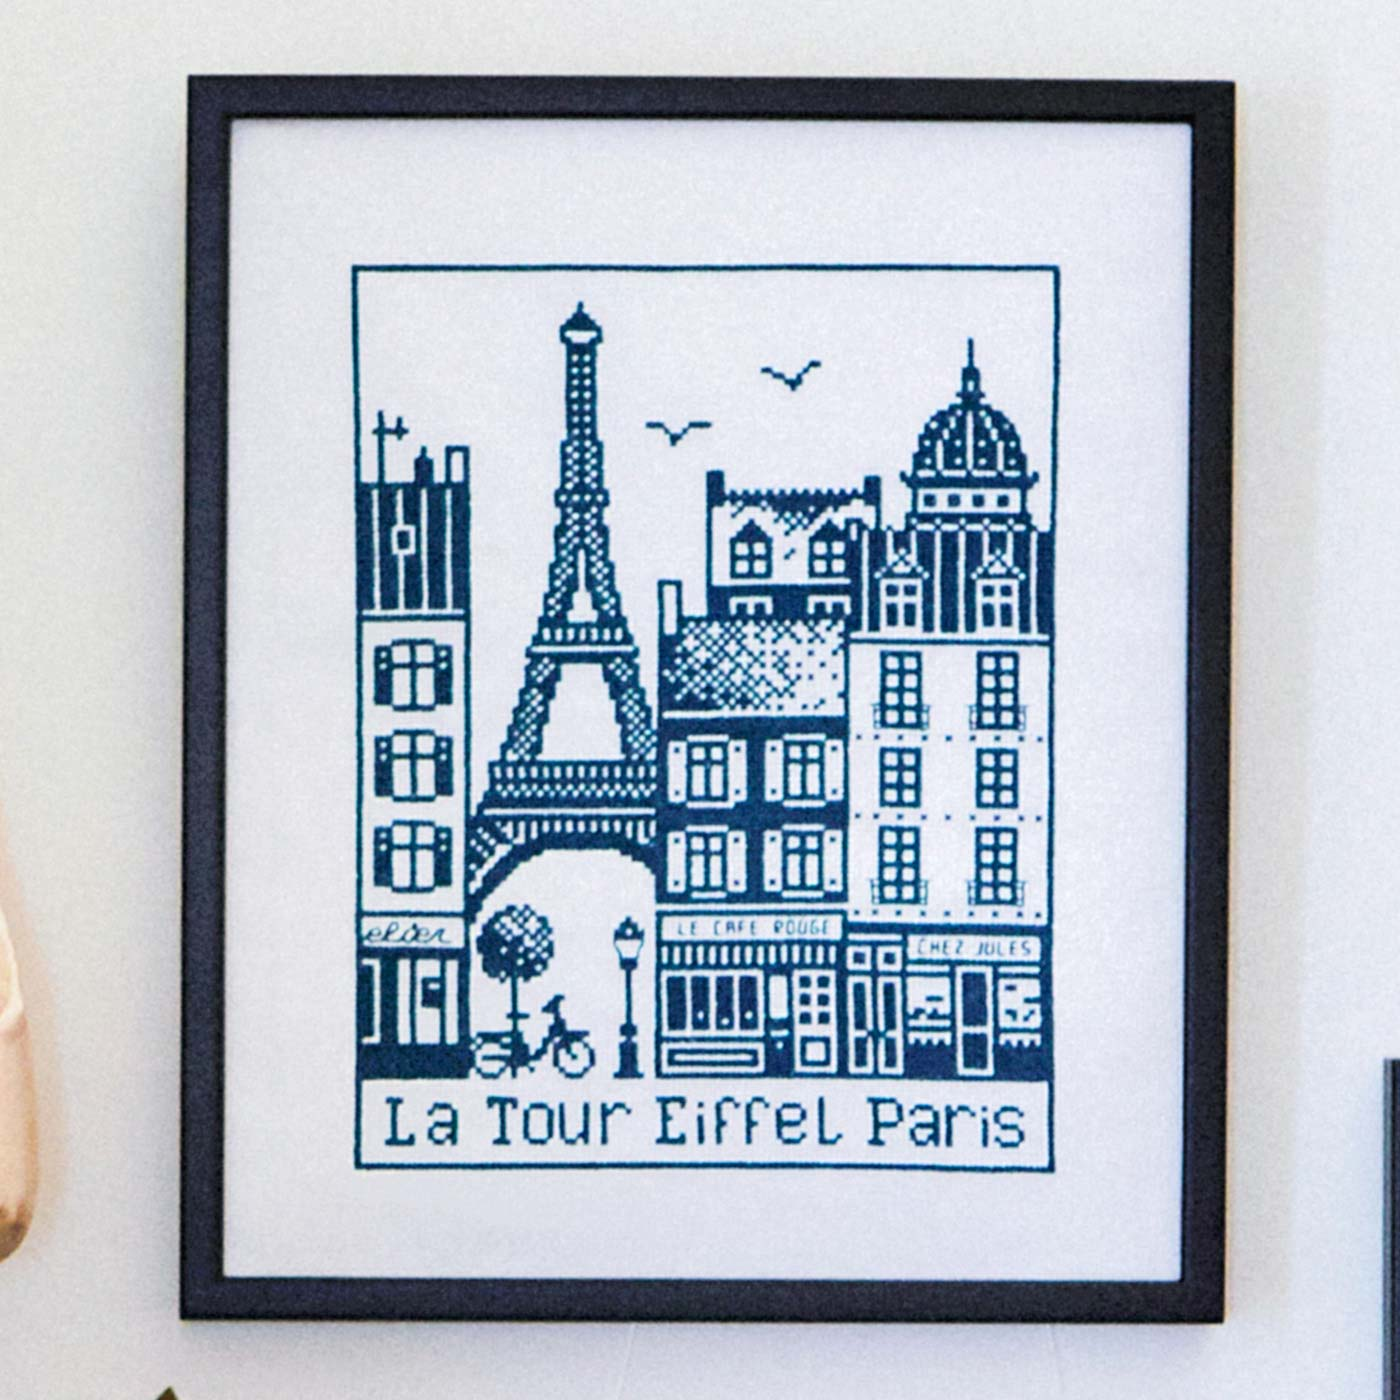 La Tour Eiffel:エッフェル塔